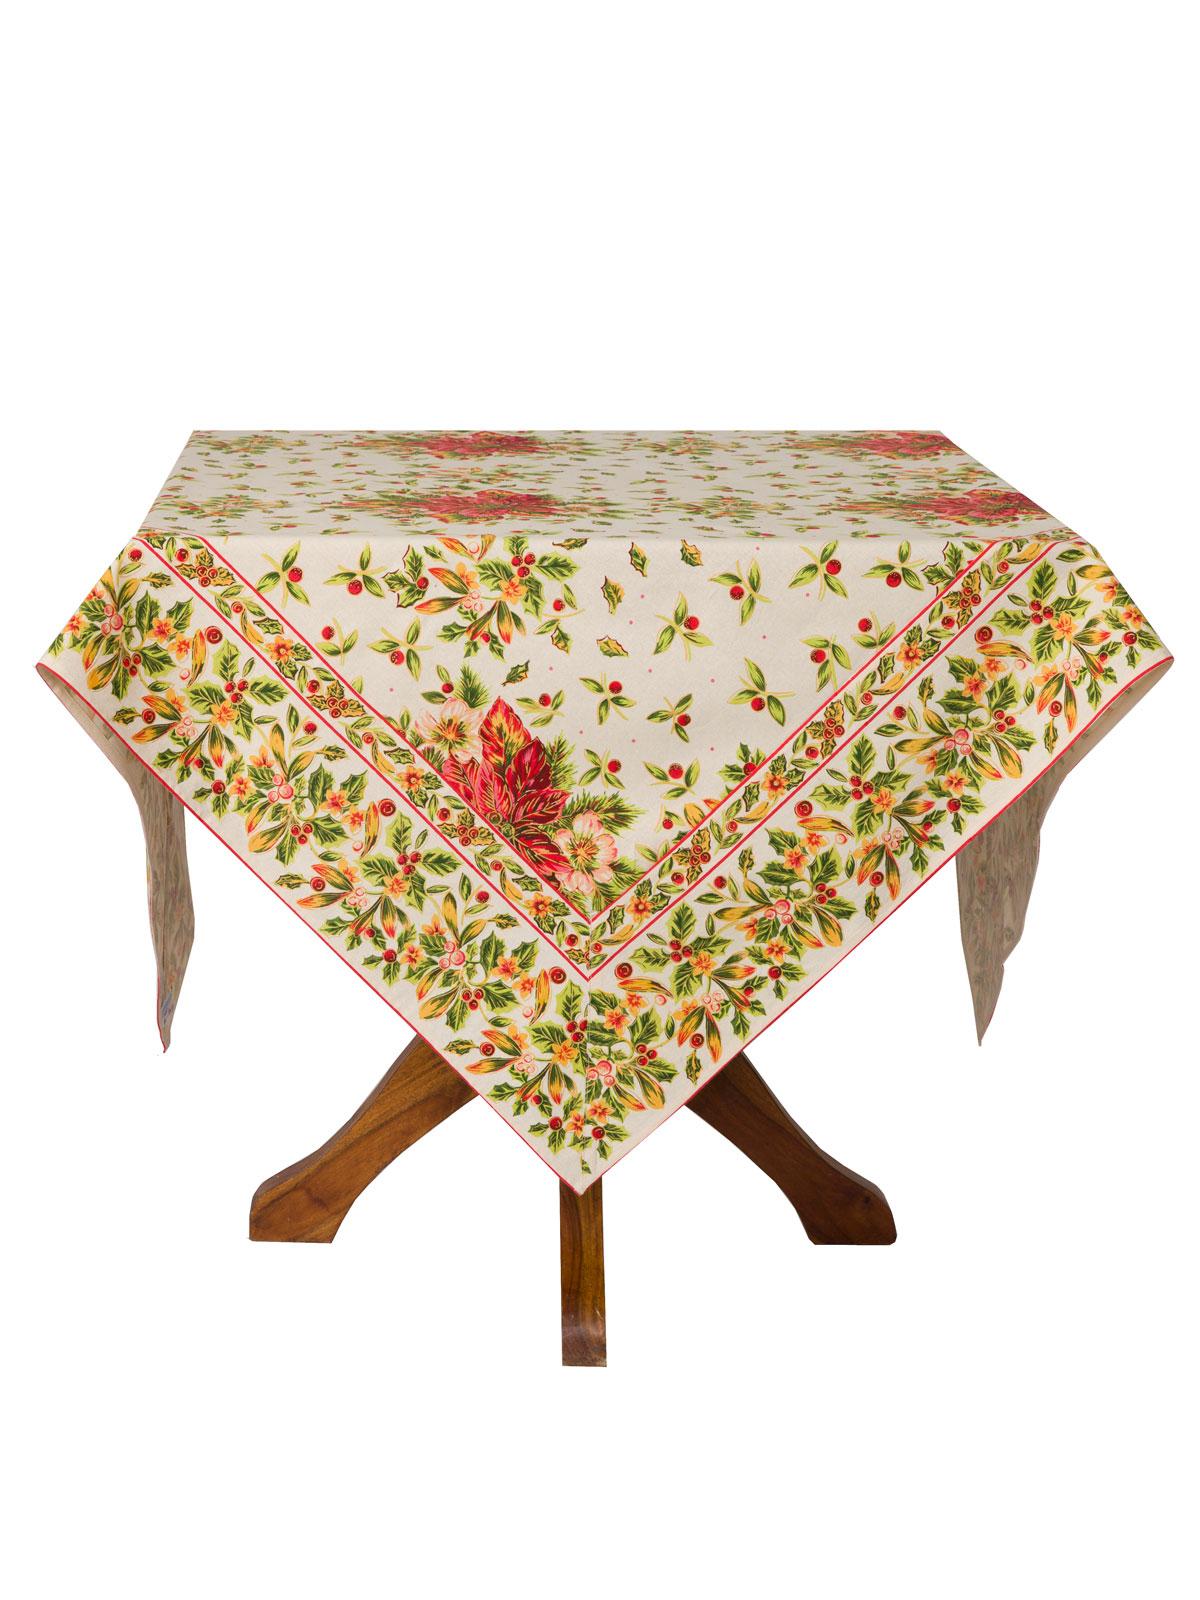 Charmant Poinsettia Tablecloth